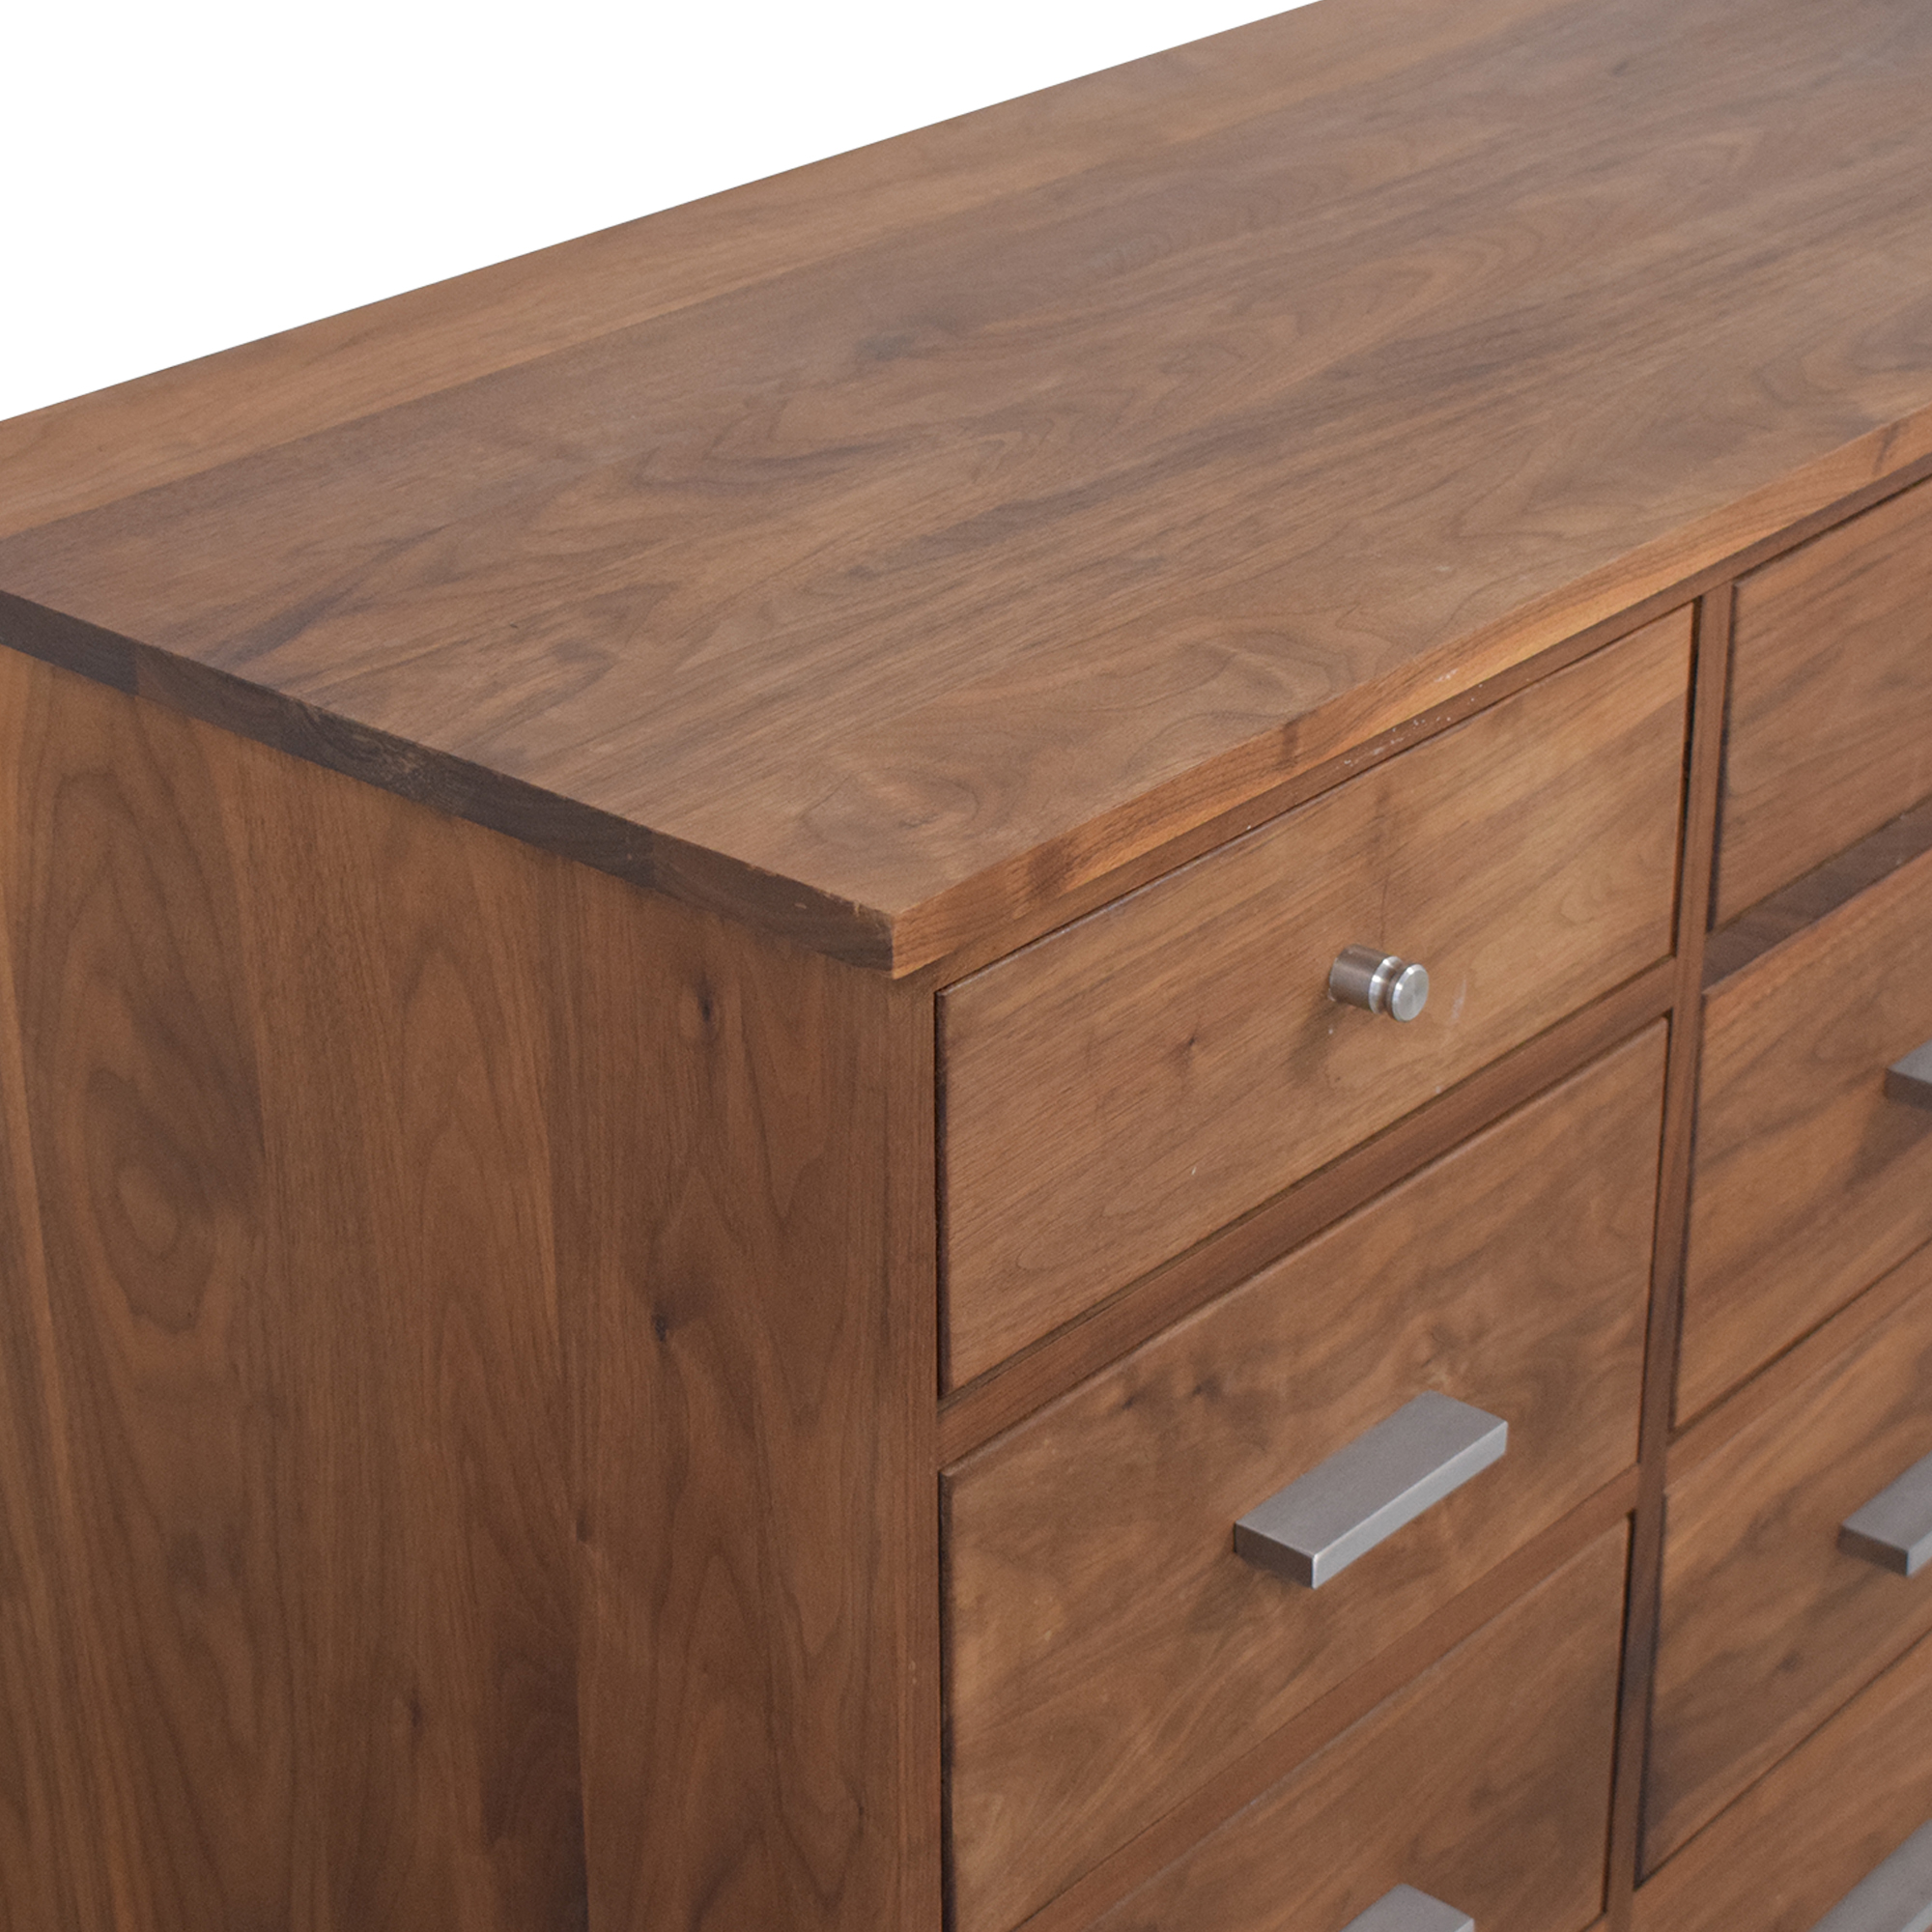 Room & Board Room & Board Linear Modern 9-Drawer Dresser ma